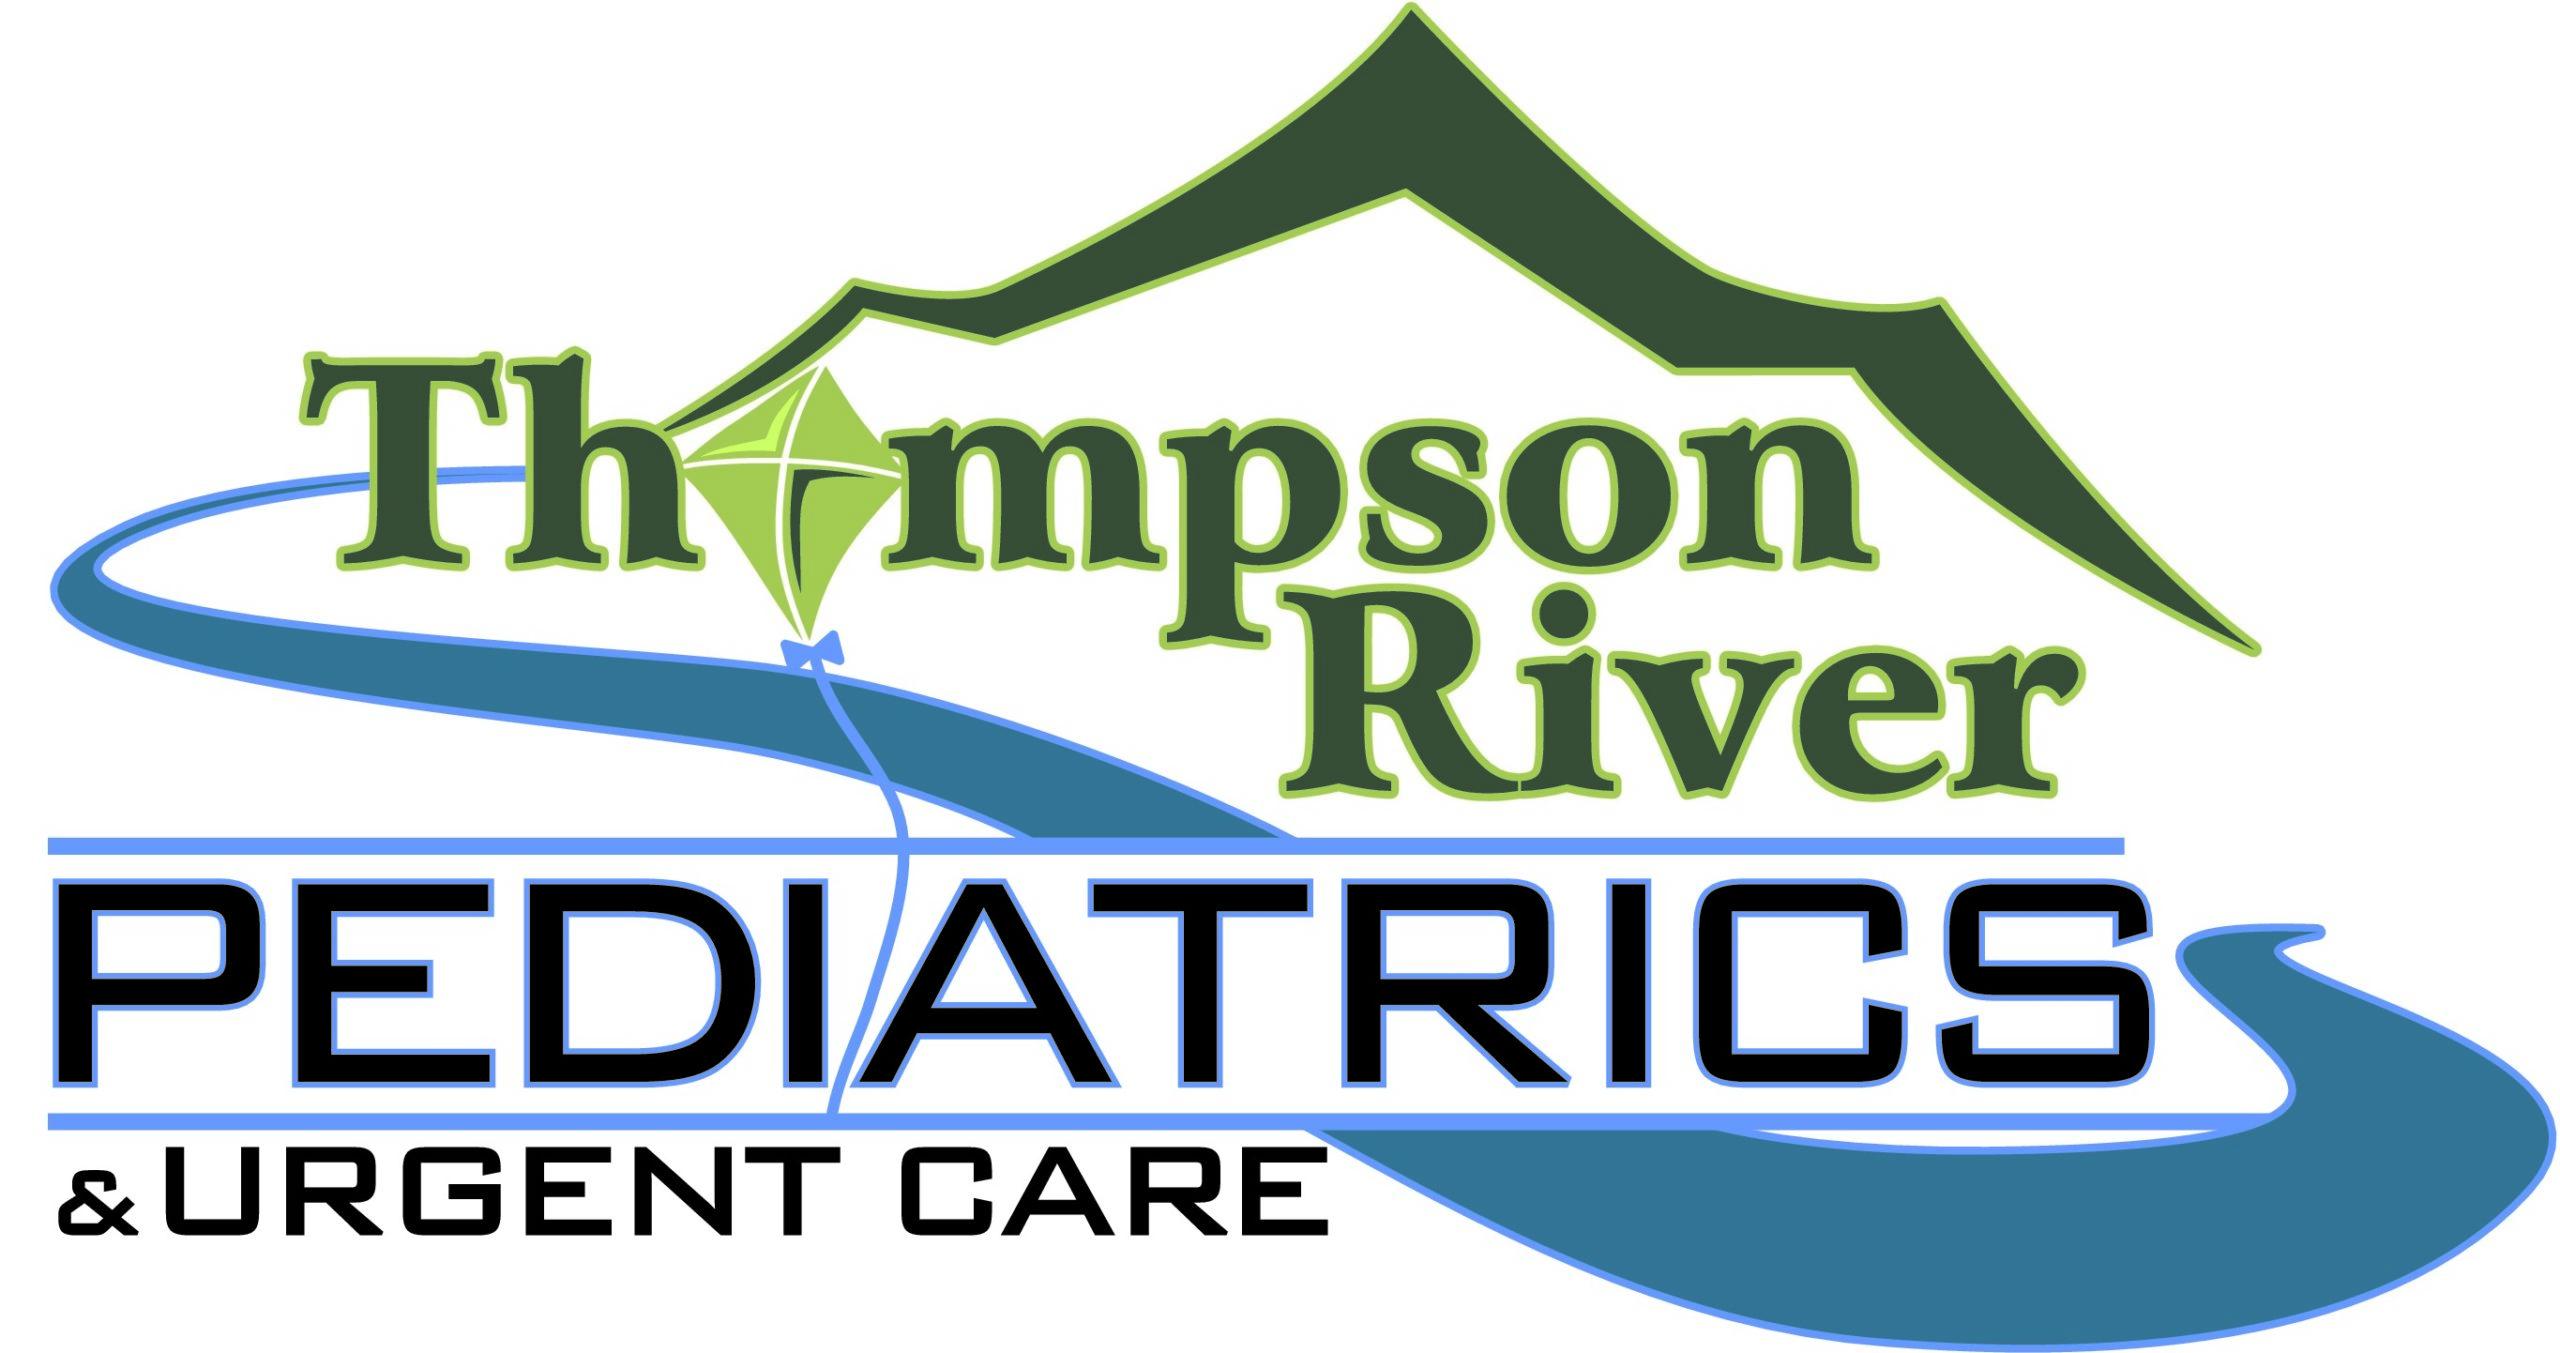 Thompson River Pediatrics